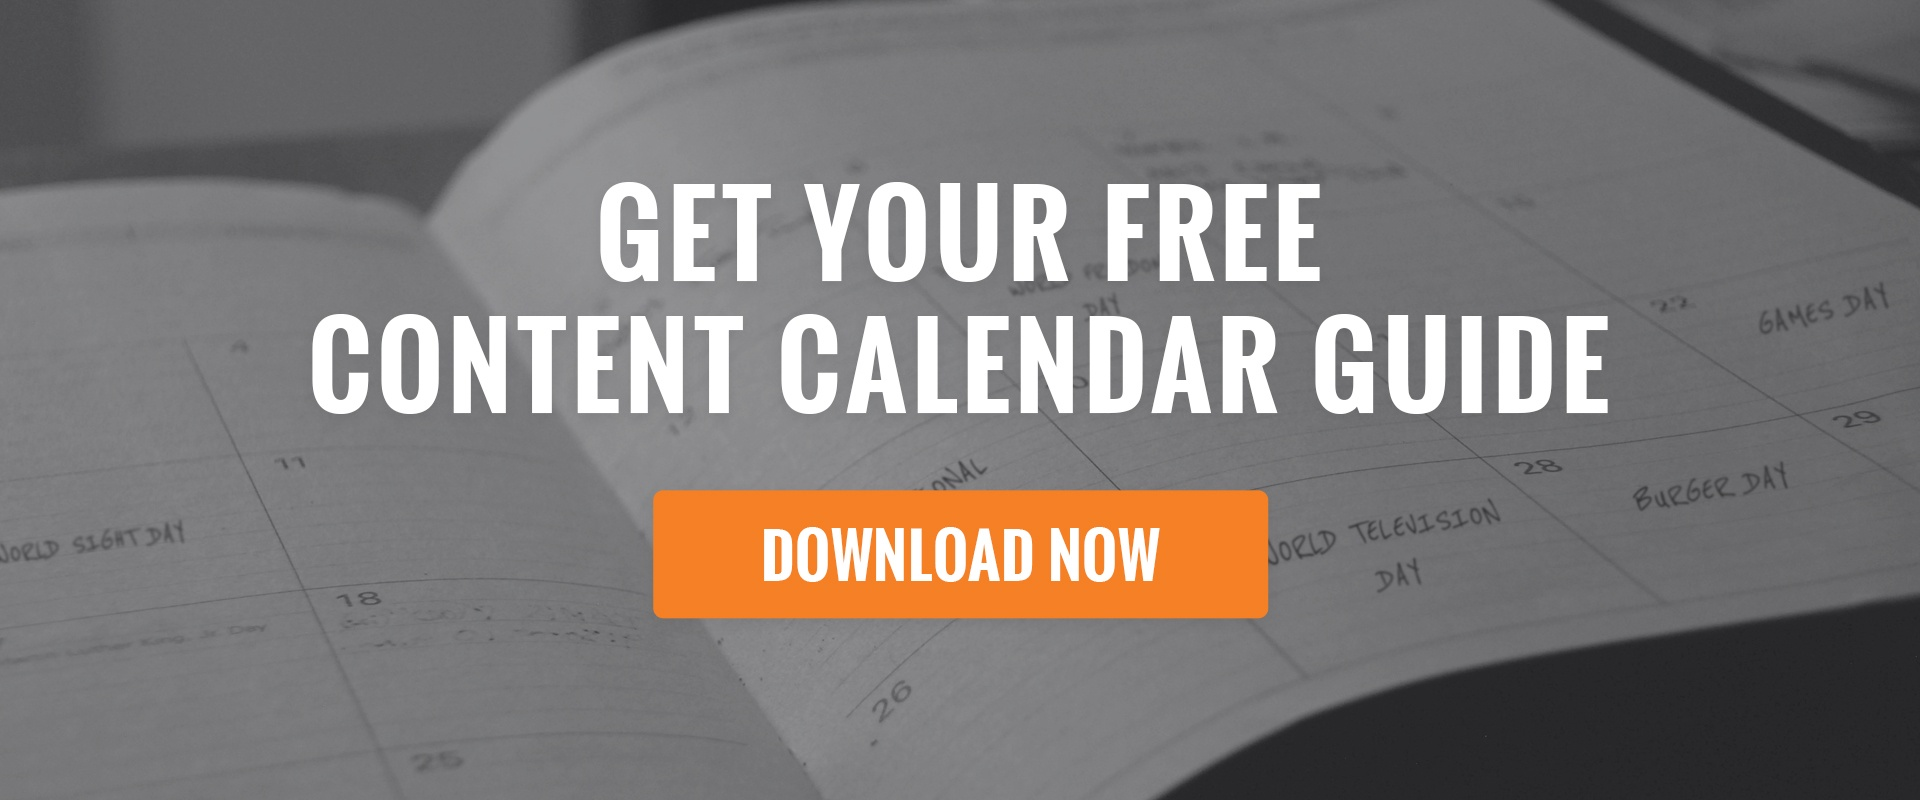 Content Calendar Guide